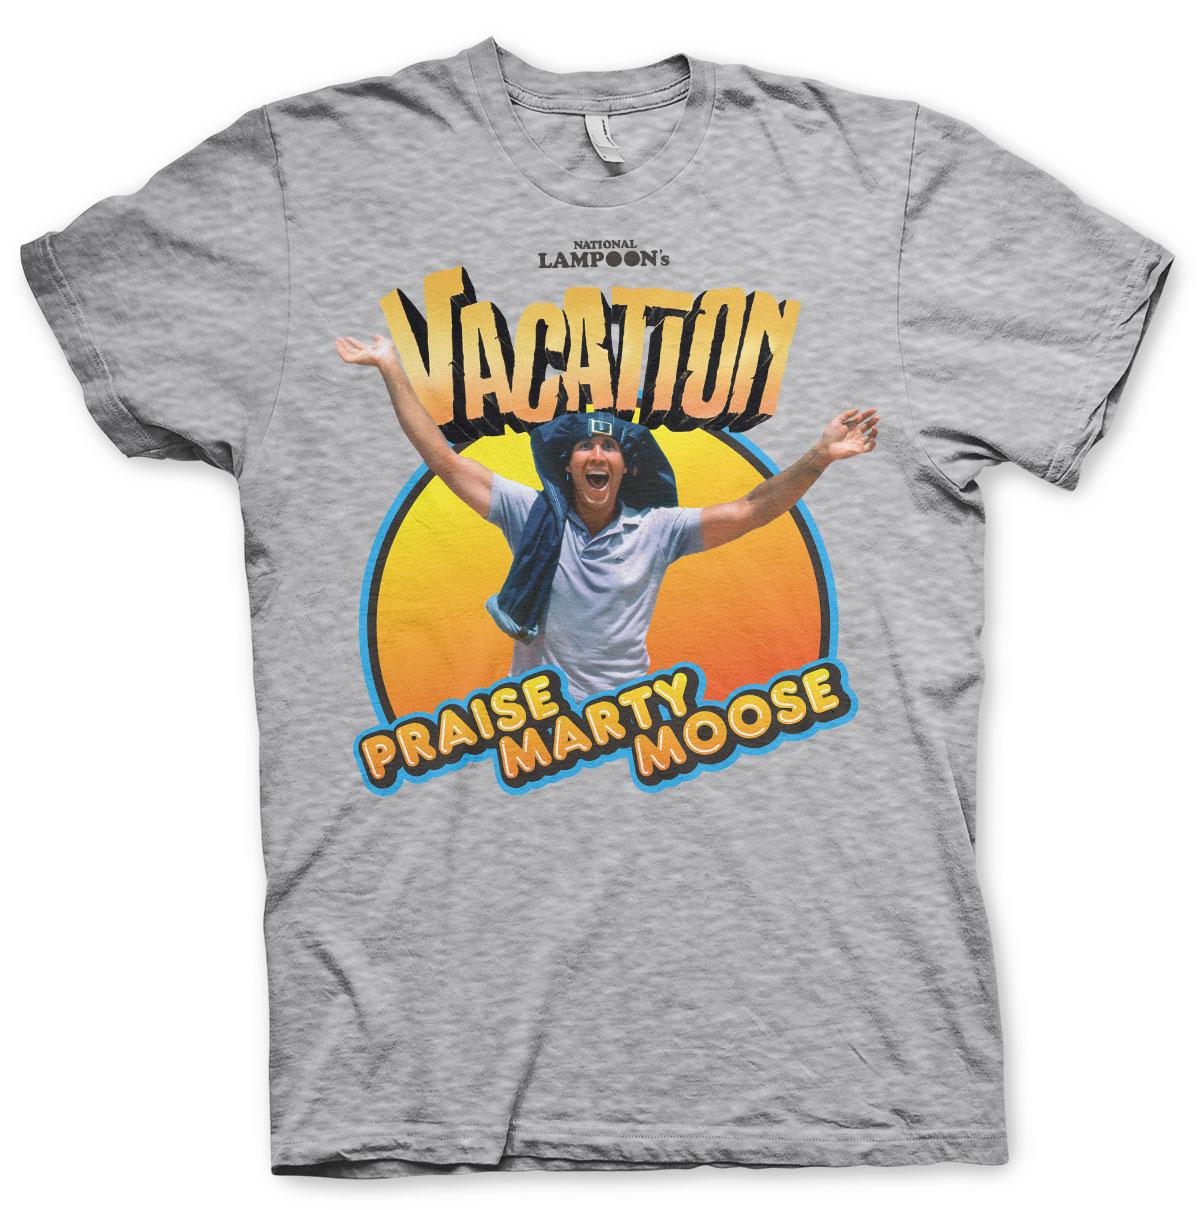 Praise Marty Moose T-Shirt